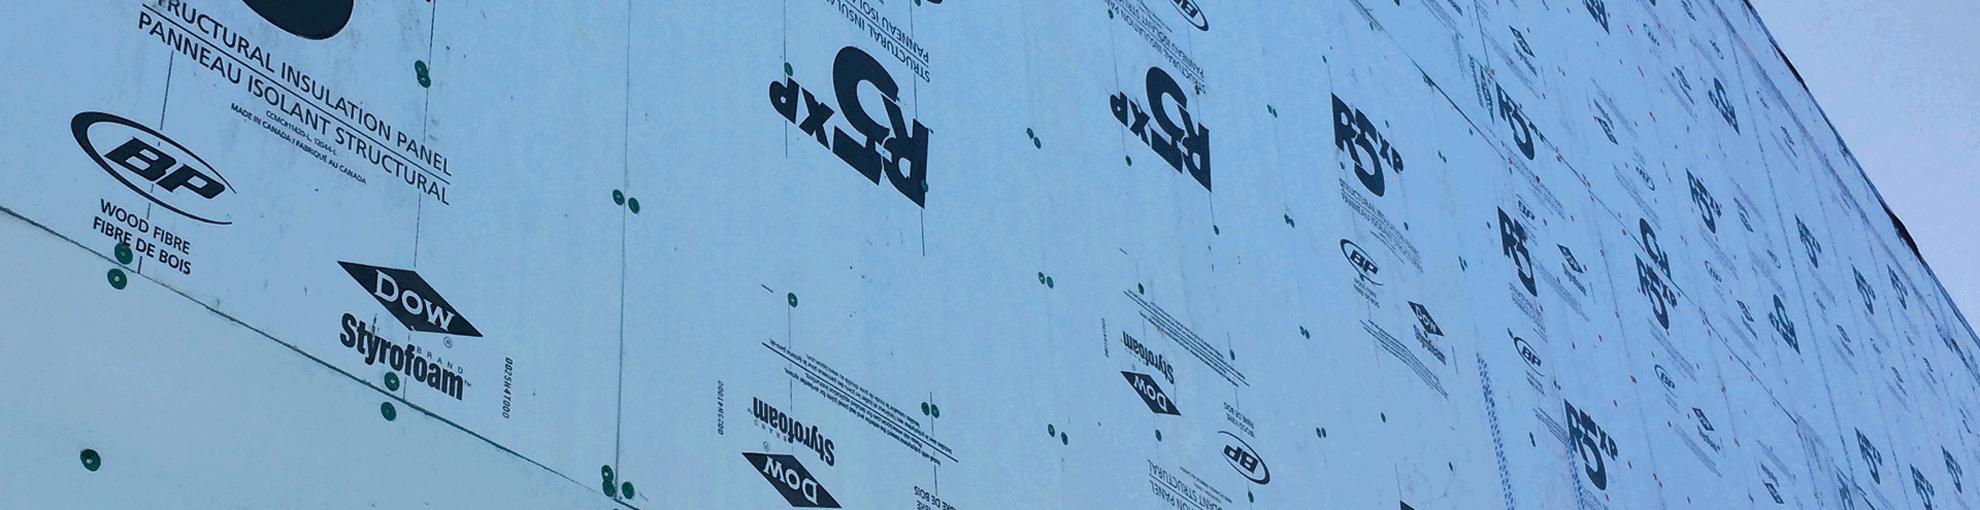 R-5 XP Panel